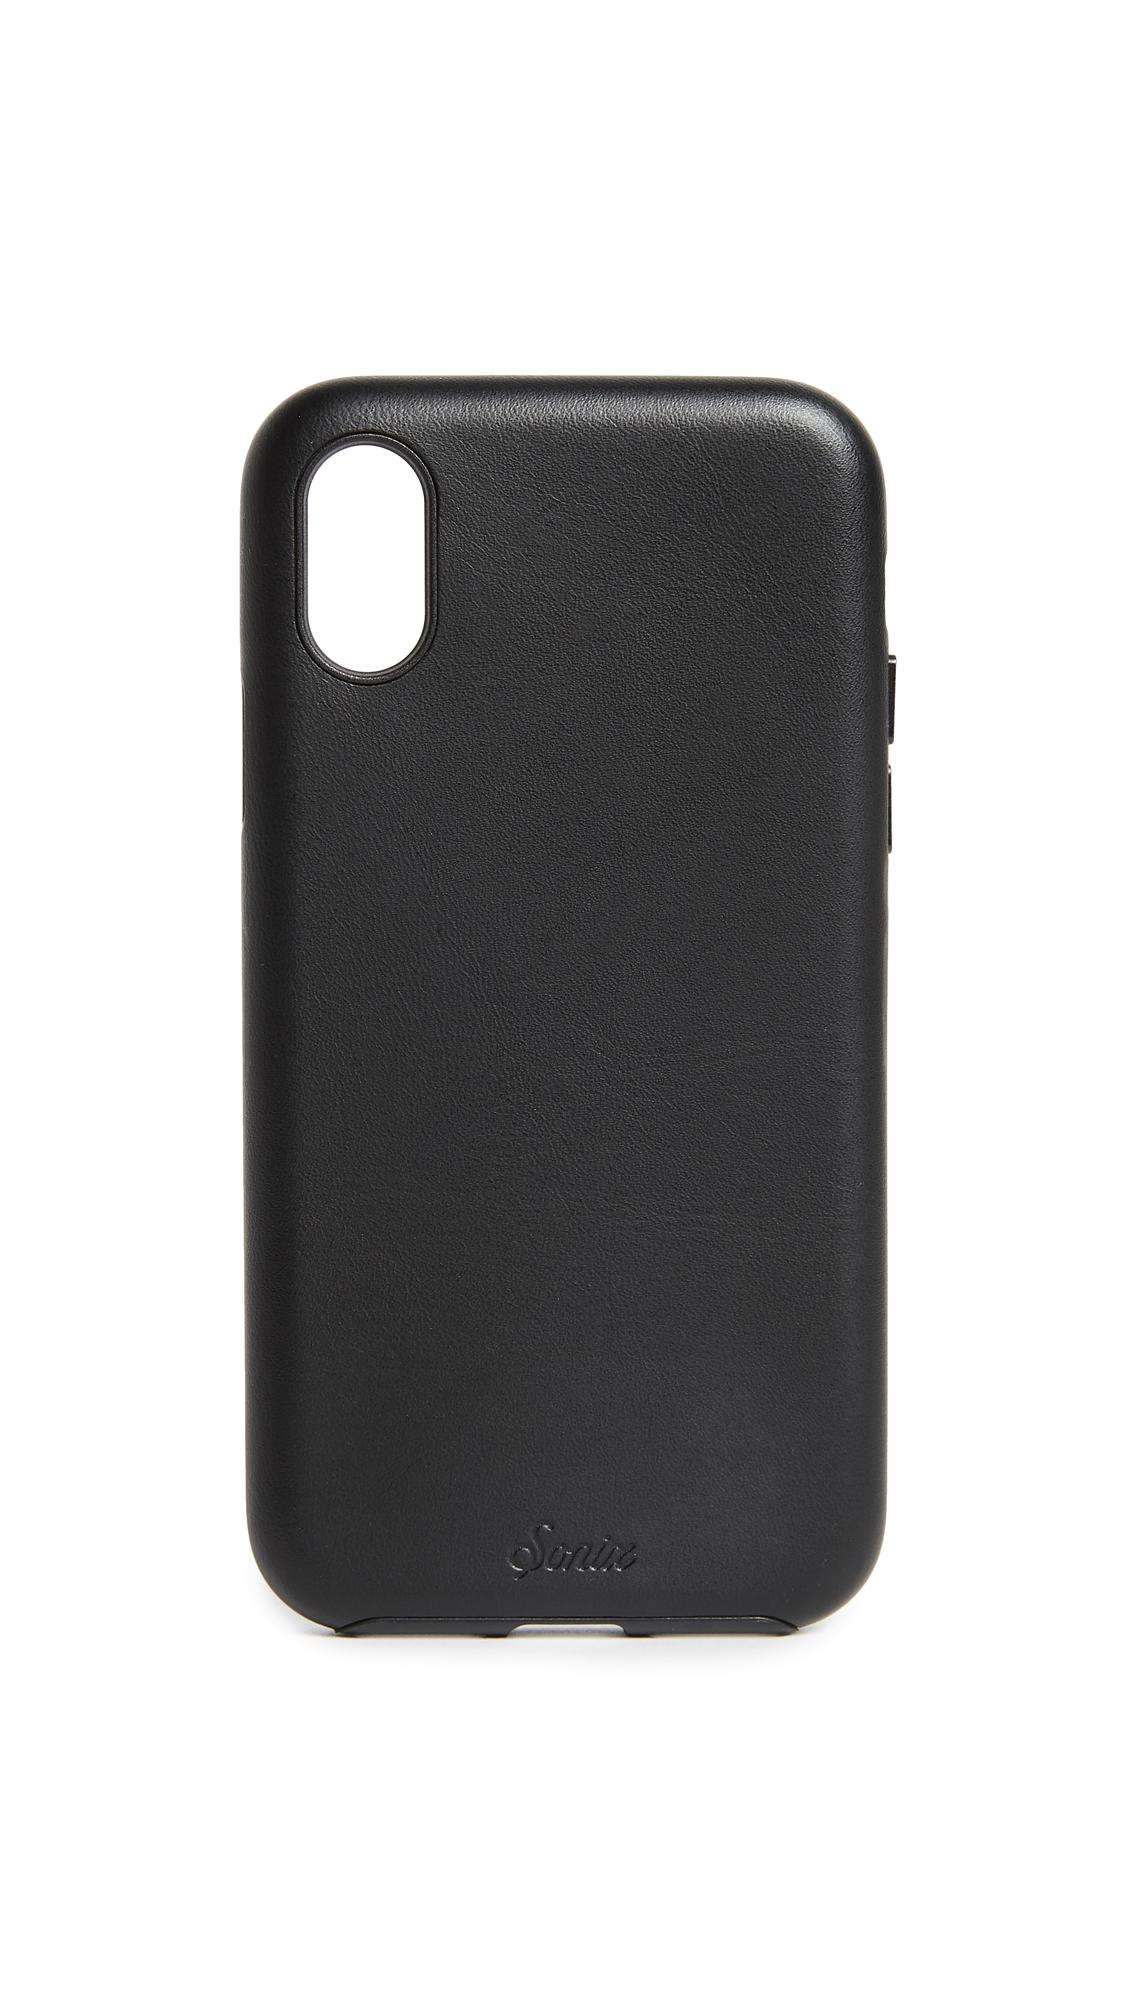 Sonix Leather IPhone X Case - Black